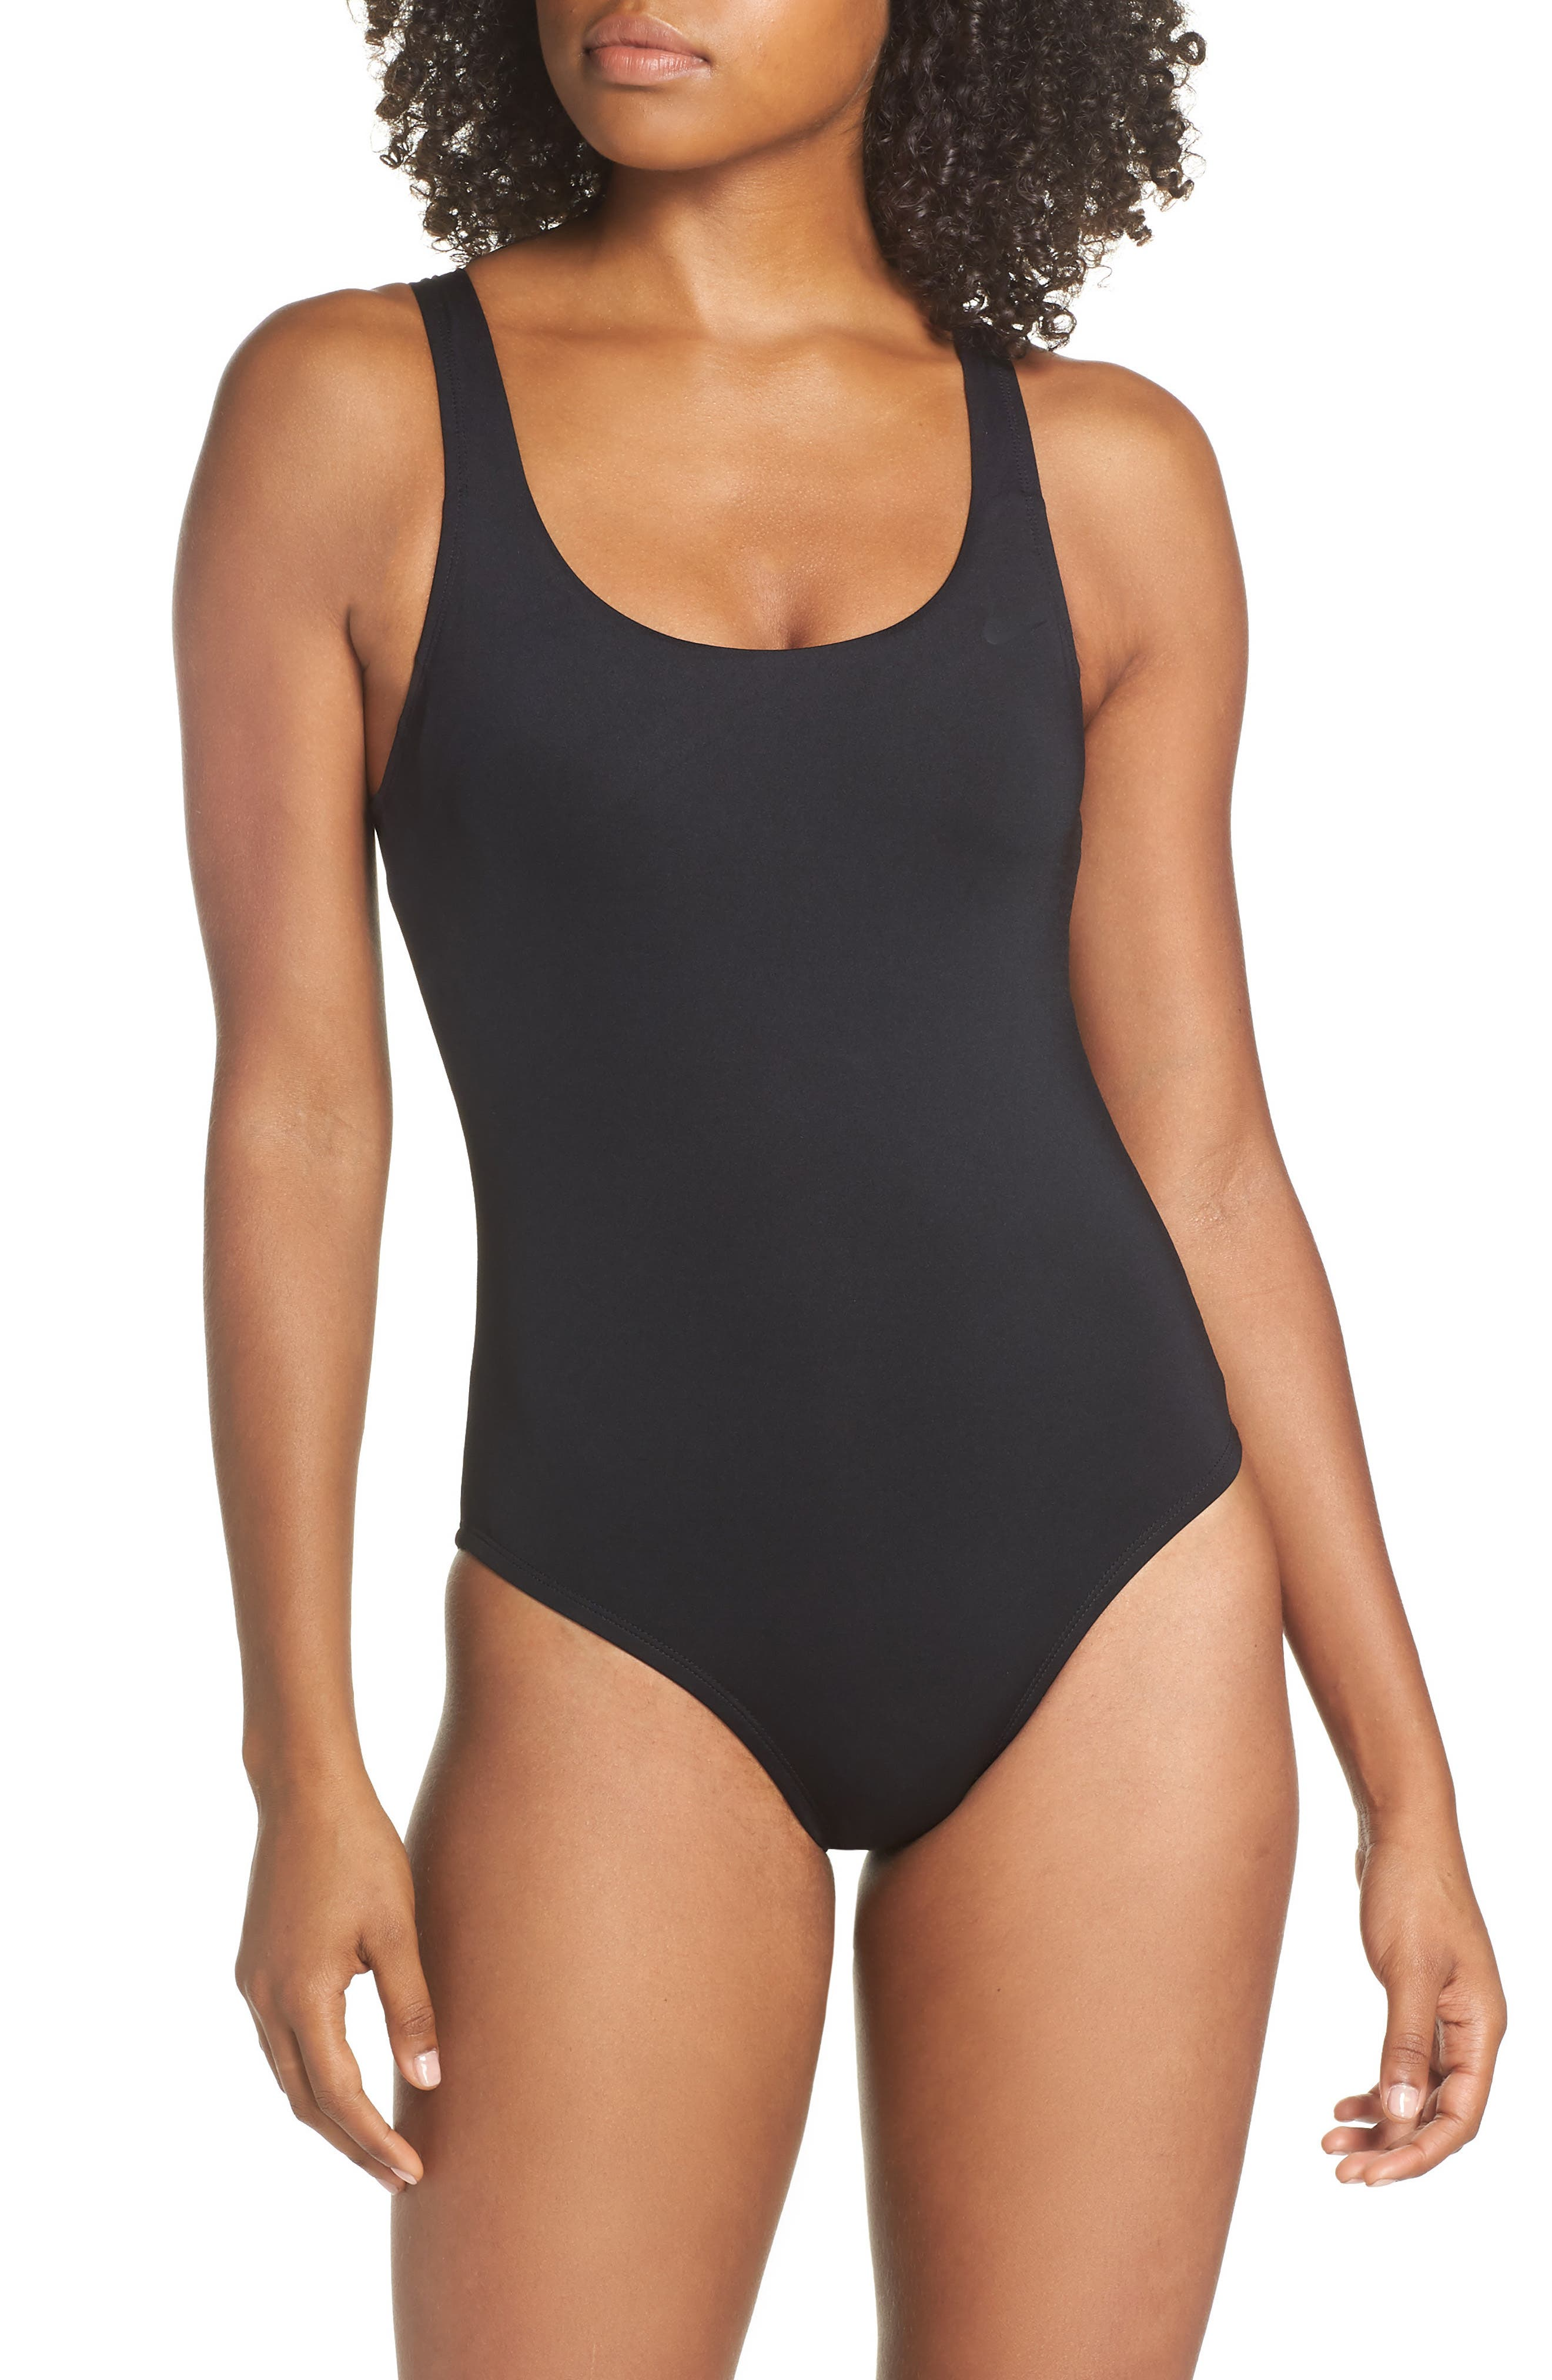 NIKE, U-Back One-Piece Swimsuit, Main thumbnail 1, color, BLACK